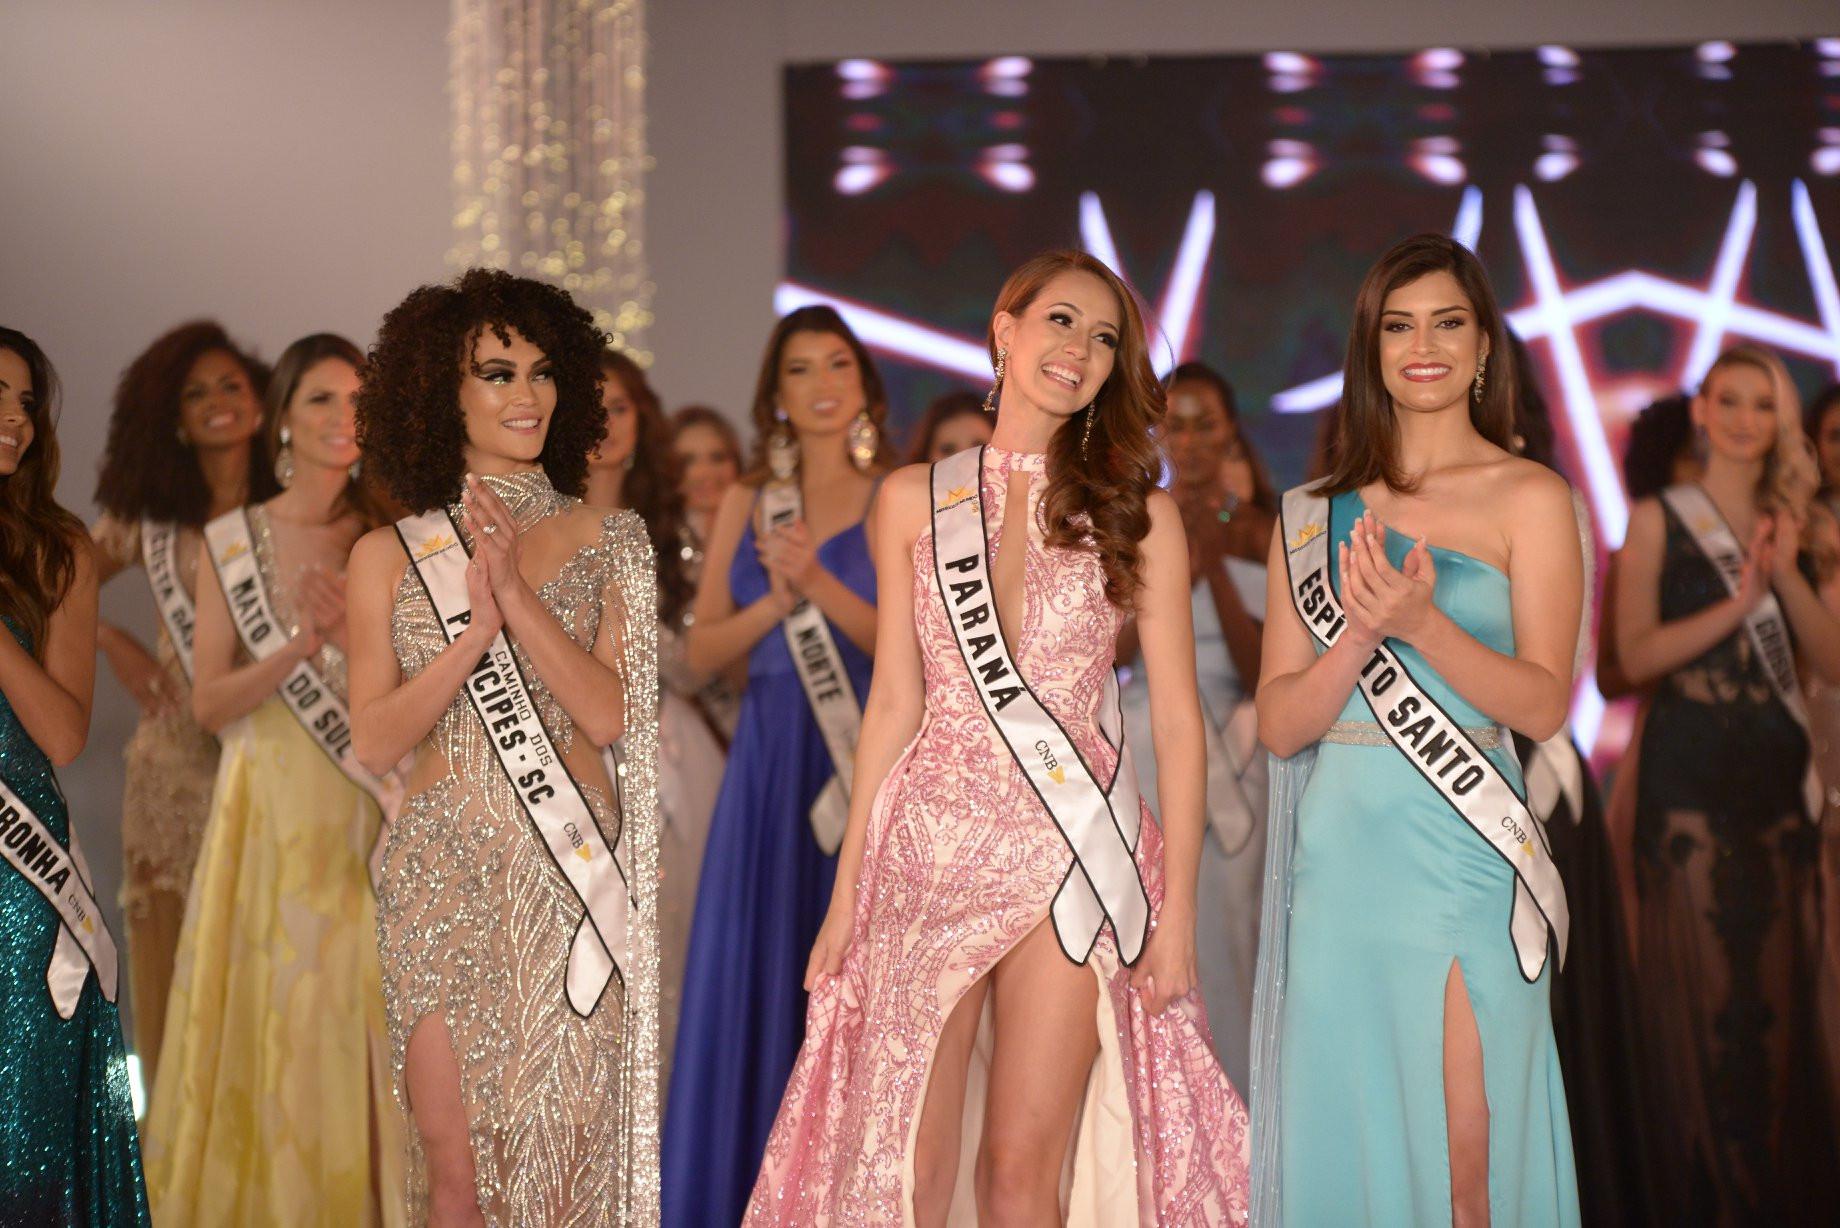 deise caroline ribas, top 10 de miss brasil mundo 2019/miss parana universo 2018/top 2 de miss teen international 2017. - Página 6 B8gfbs10